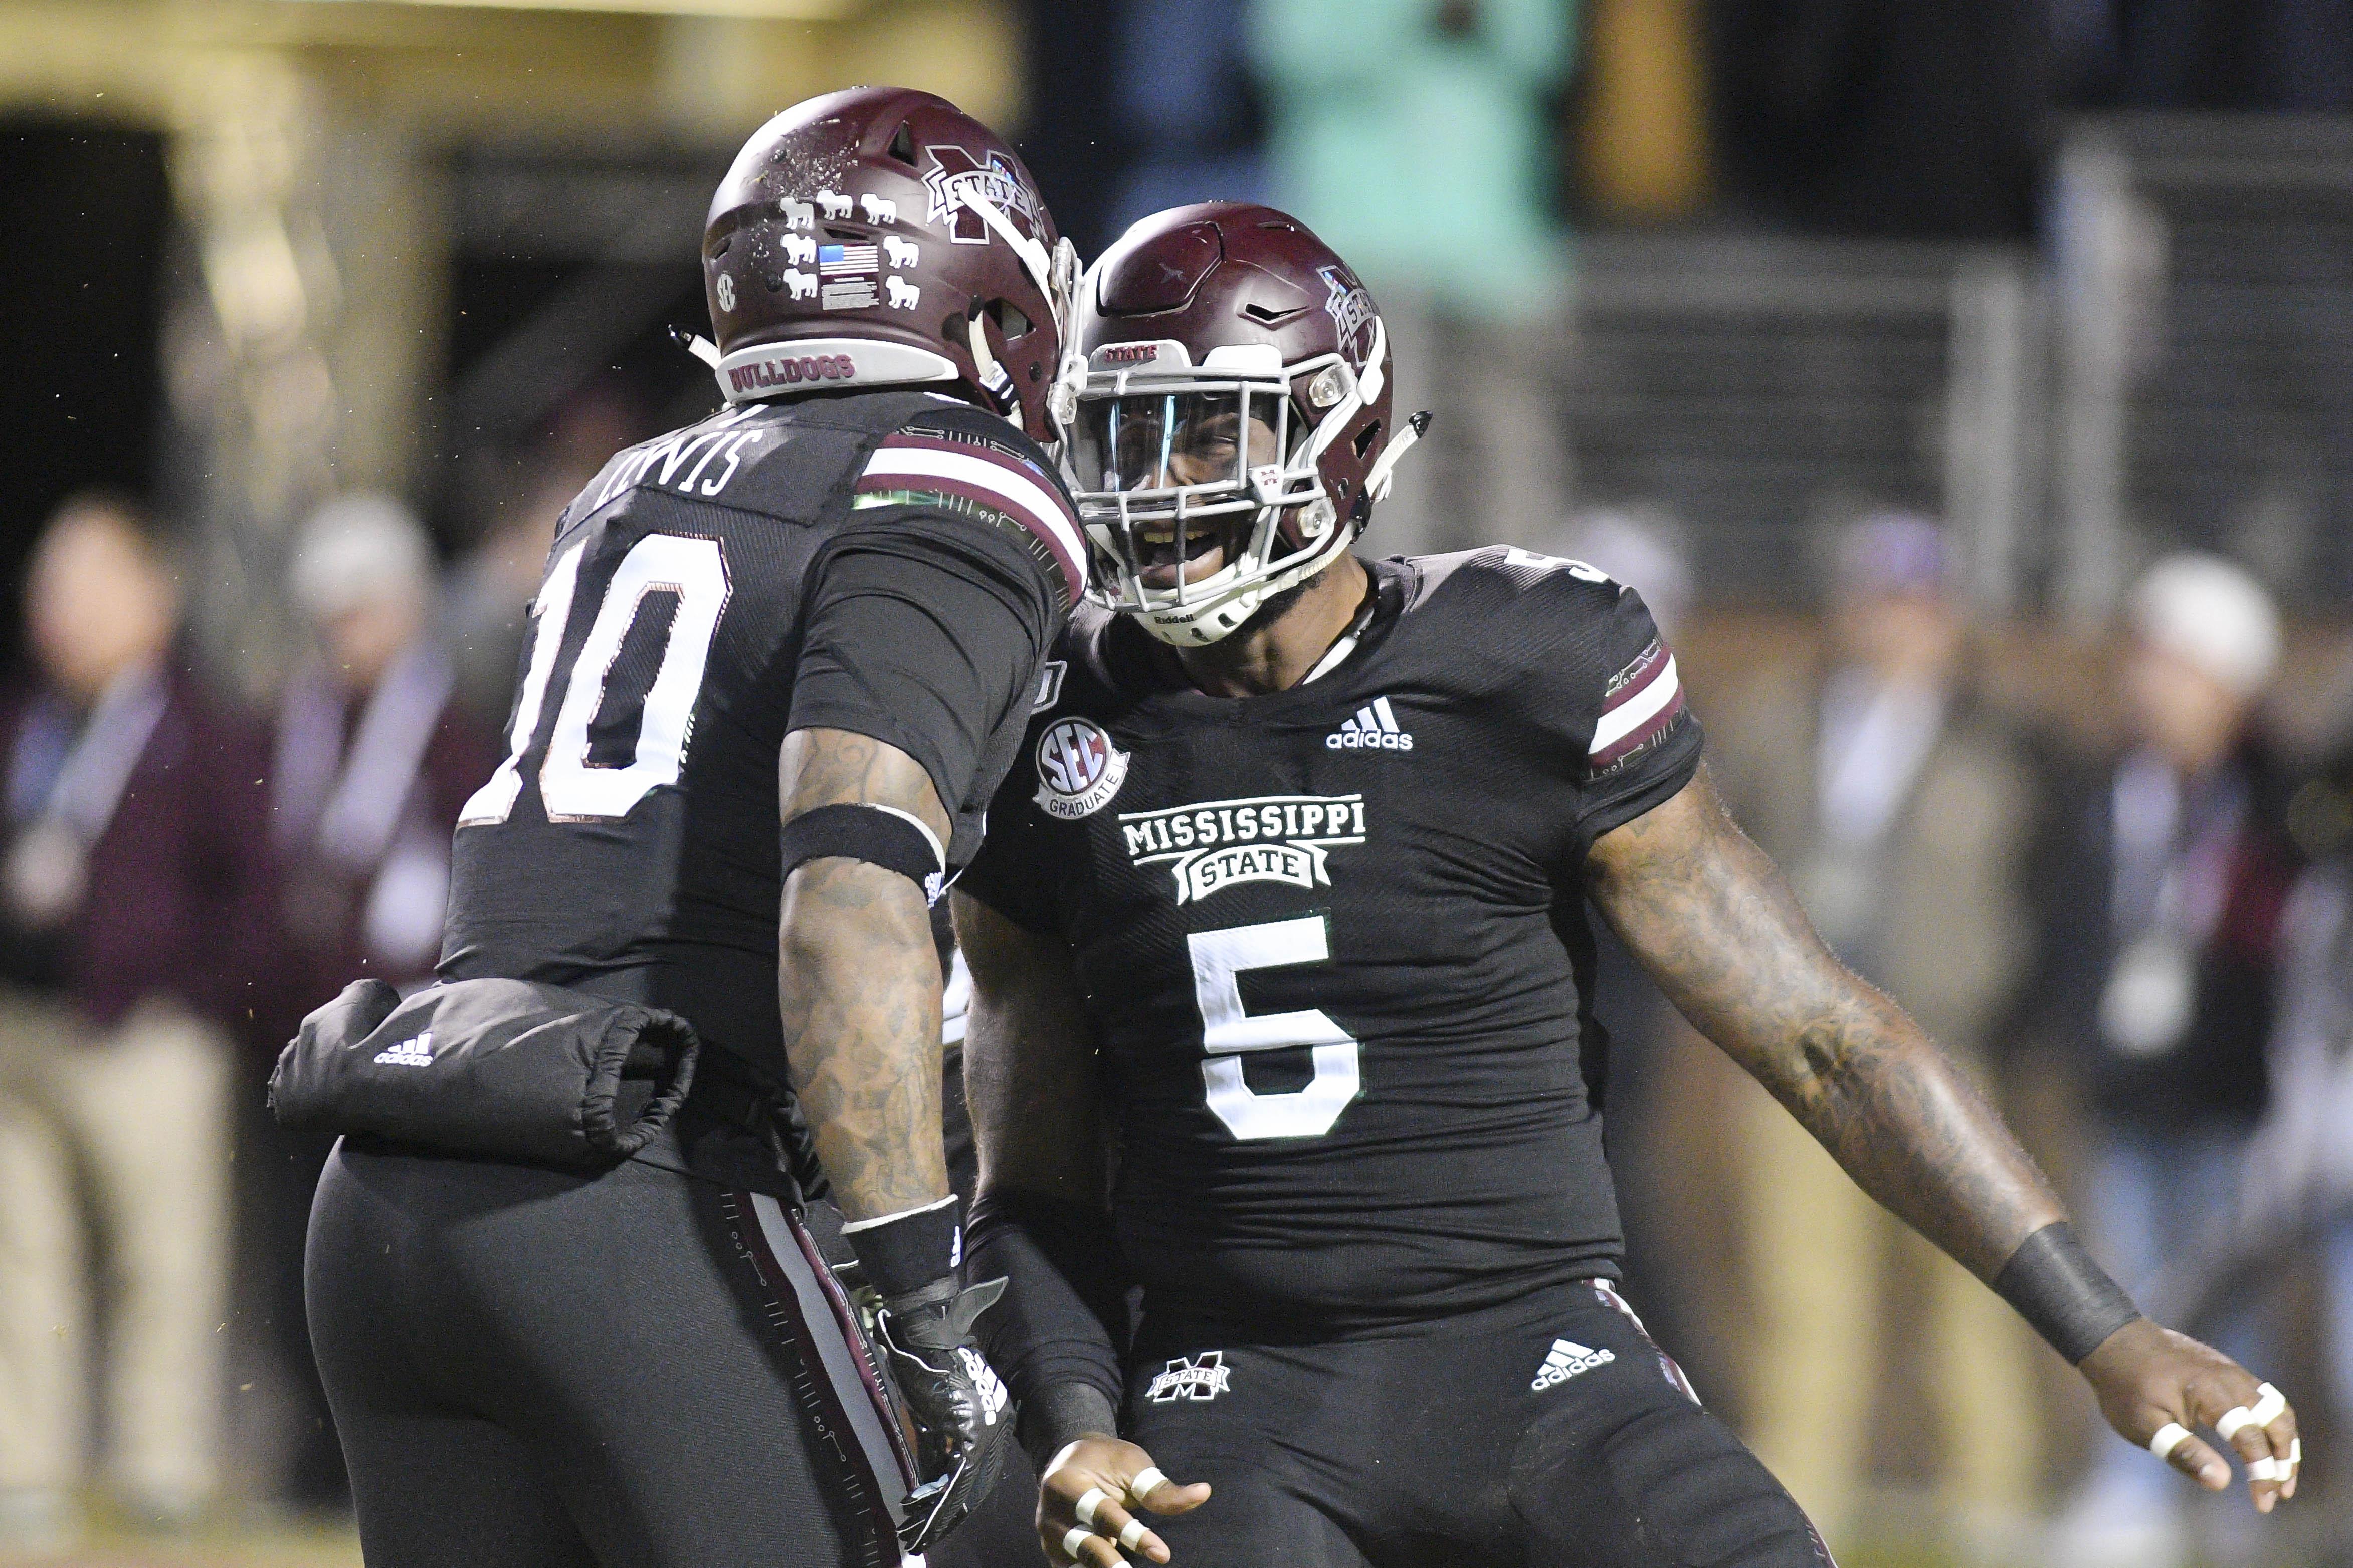 NCAA Football: Abilene Christian at Mississippi State